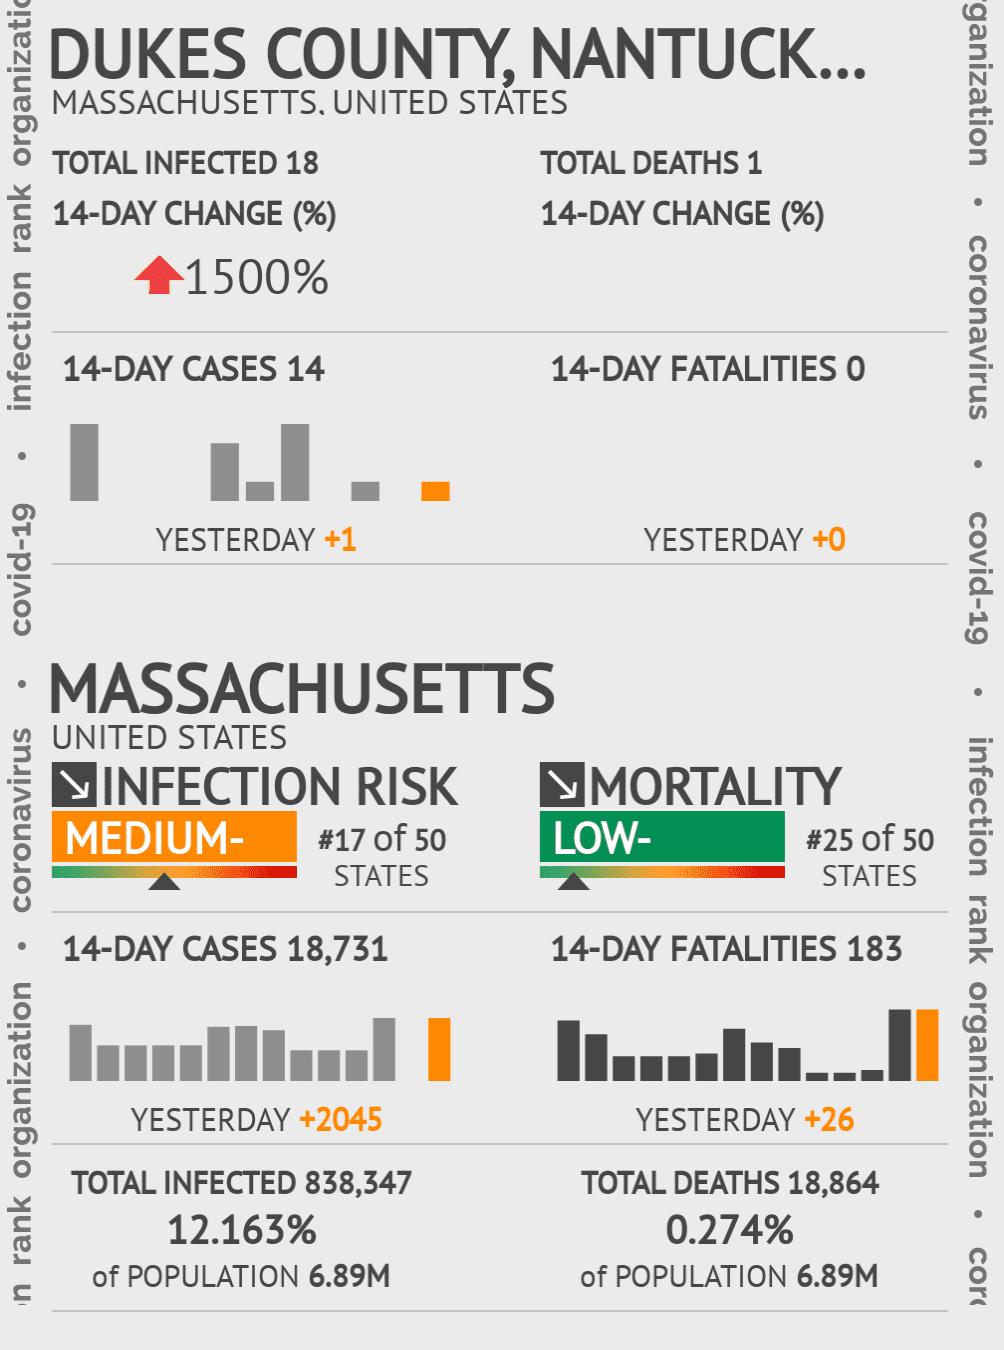 Dukes County, Nantucket County Coronavirus Covid-19 Risk of Infection on April 07, 2020